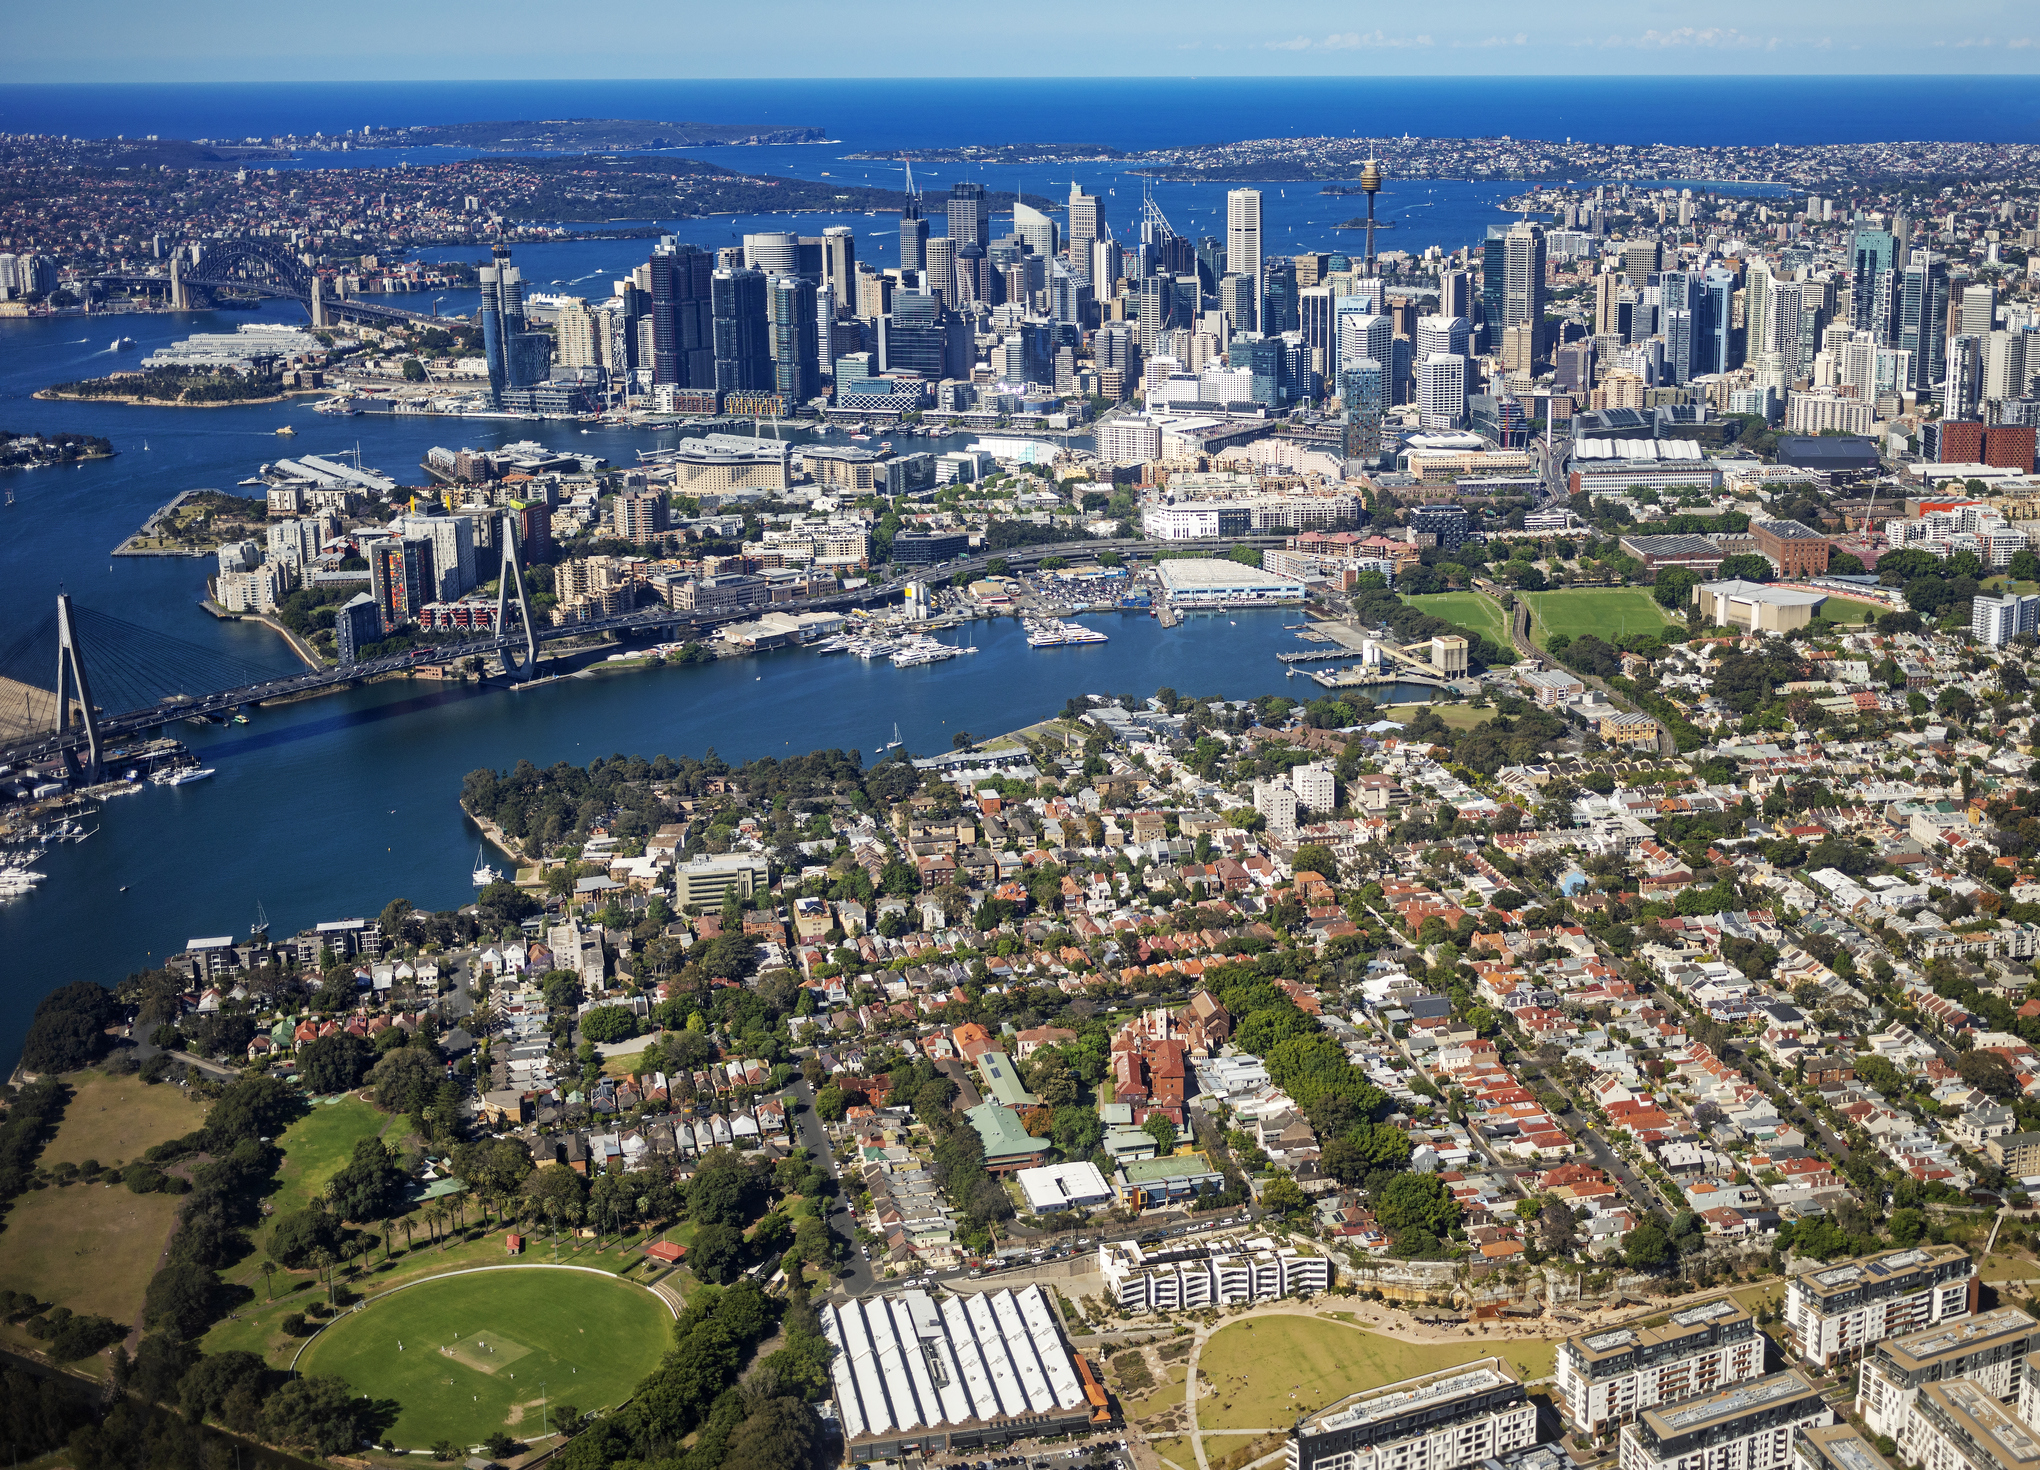 Sydney city skyline with inner suburbs of Glebe and Pyrmont, Australia, aerial photography